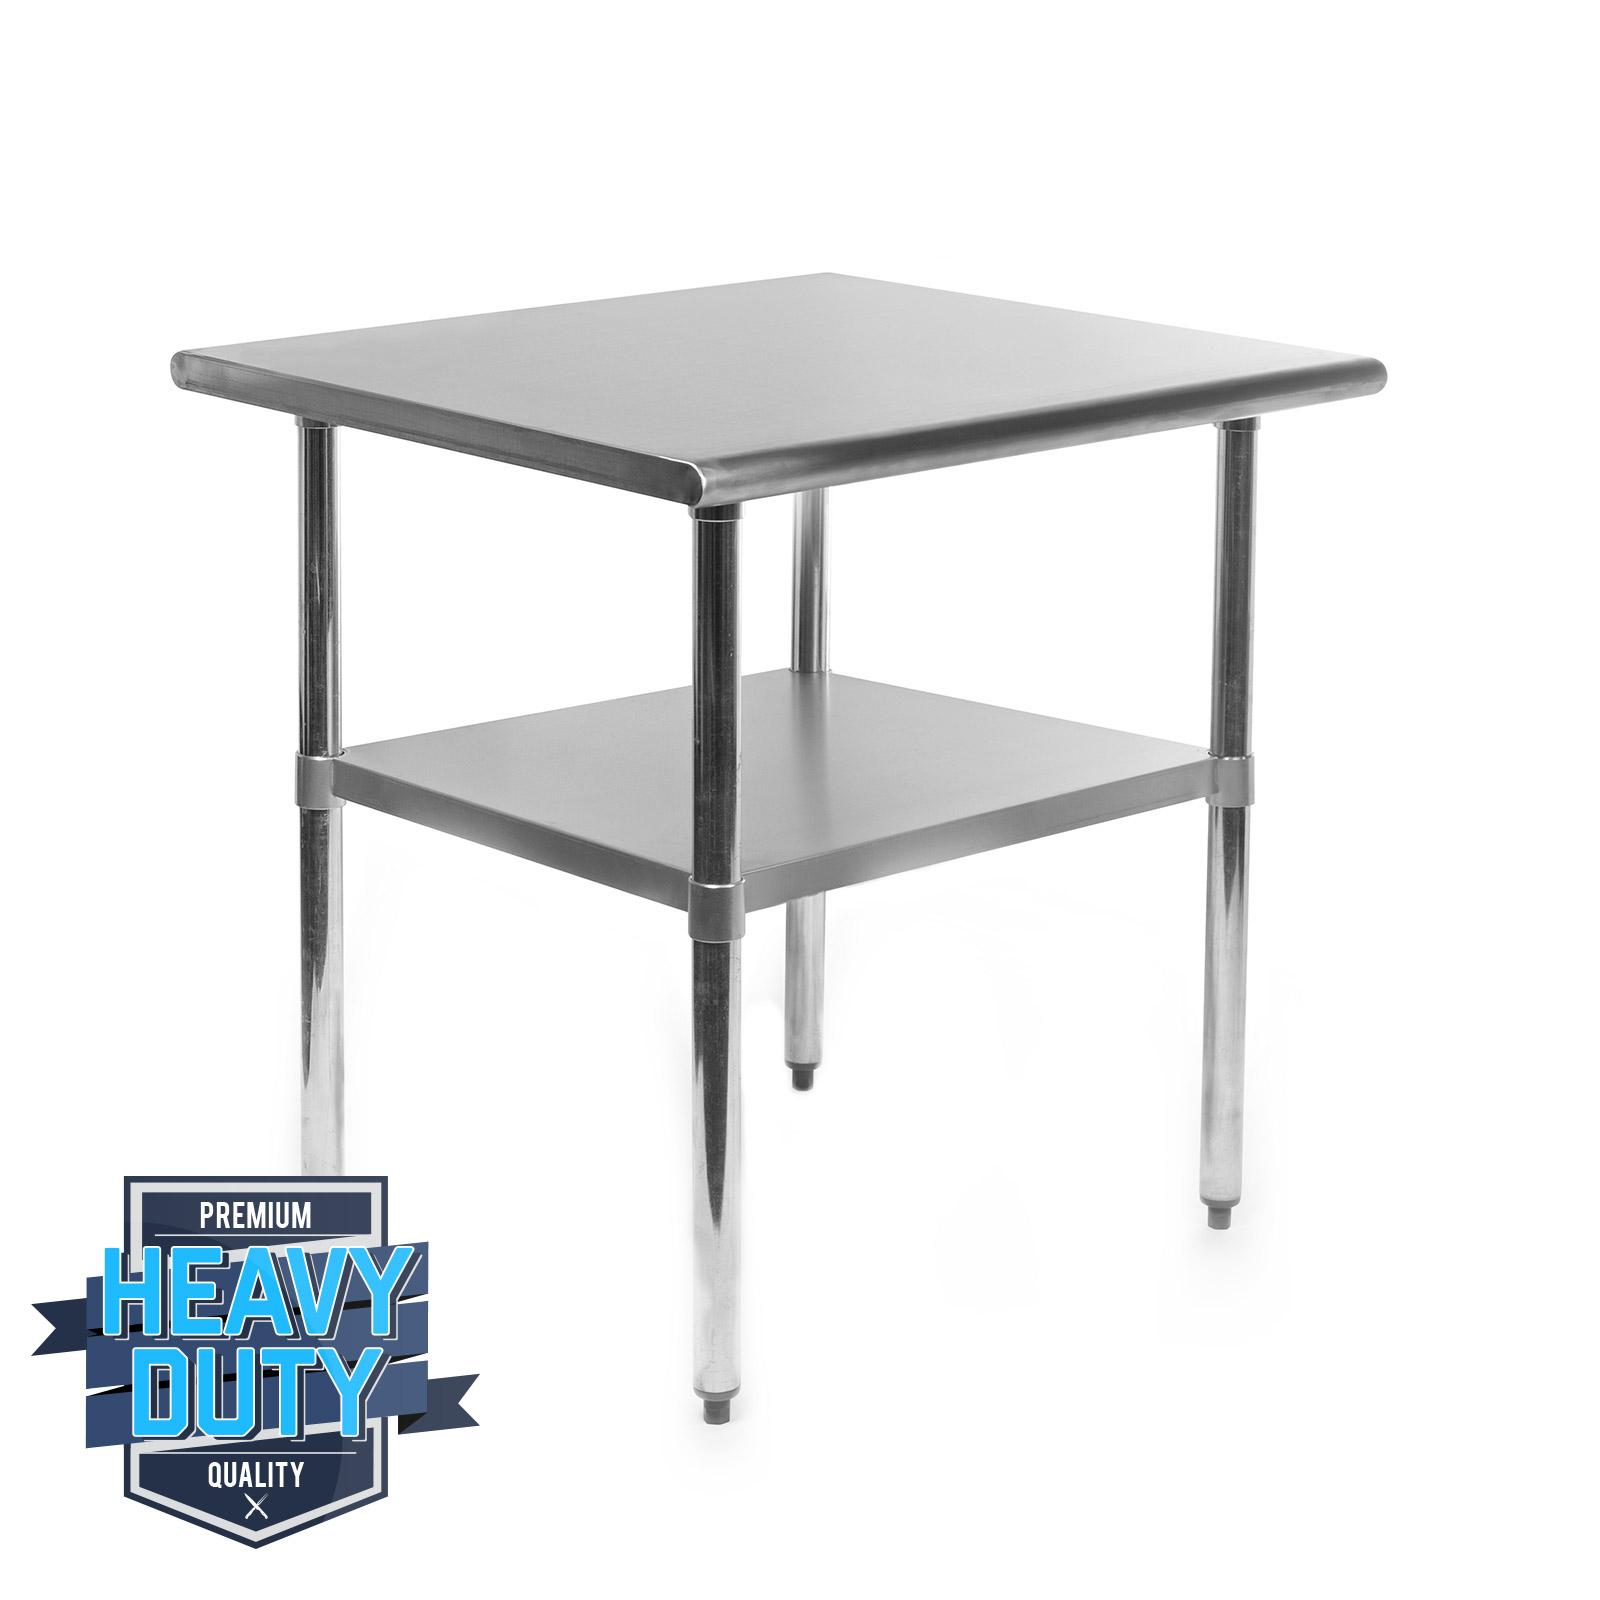 stainless steel commercial kitchen work food prep table 24 x 30 ebay. Black Bedroom Furniture Sets. Home Design Ideas